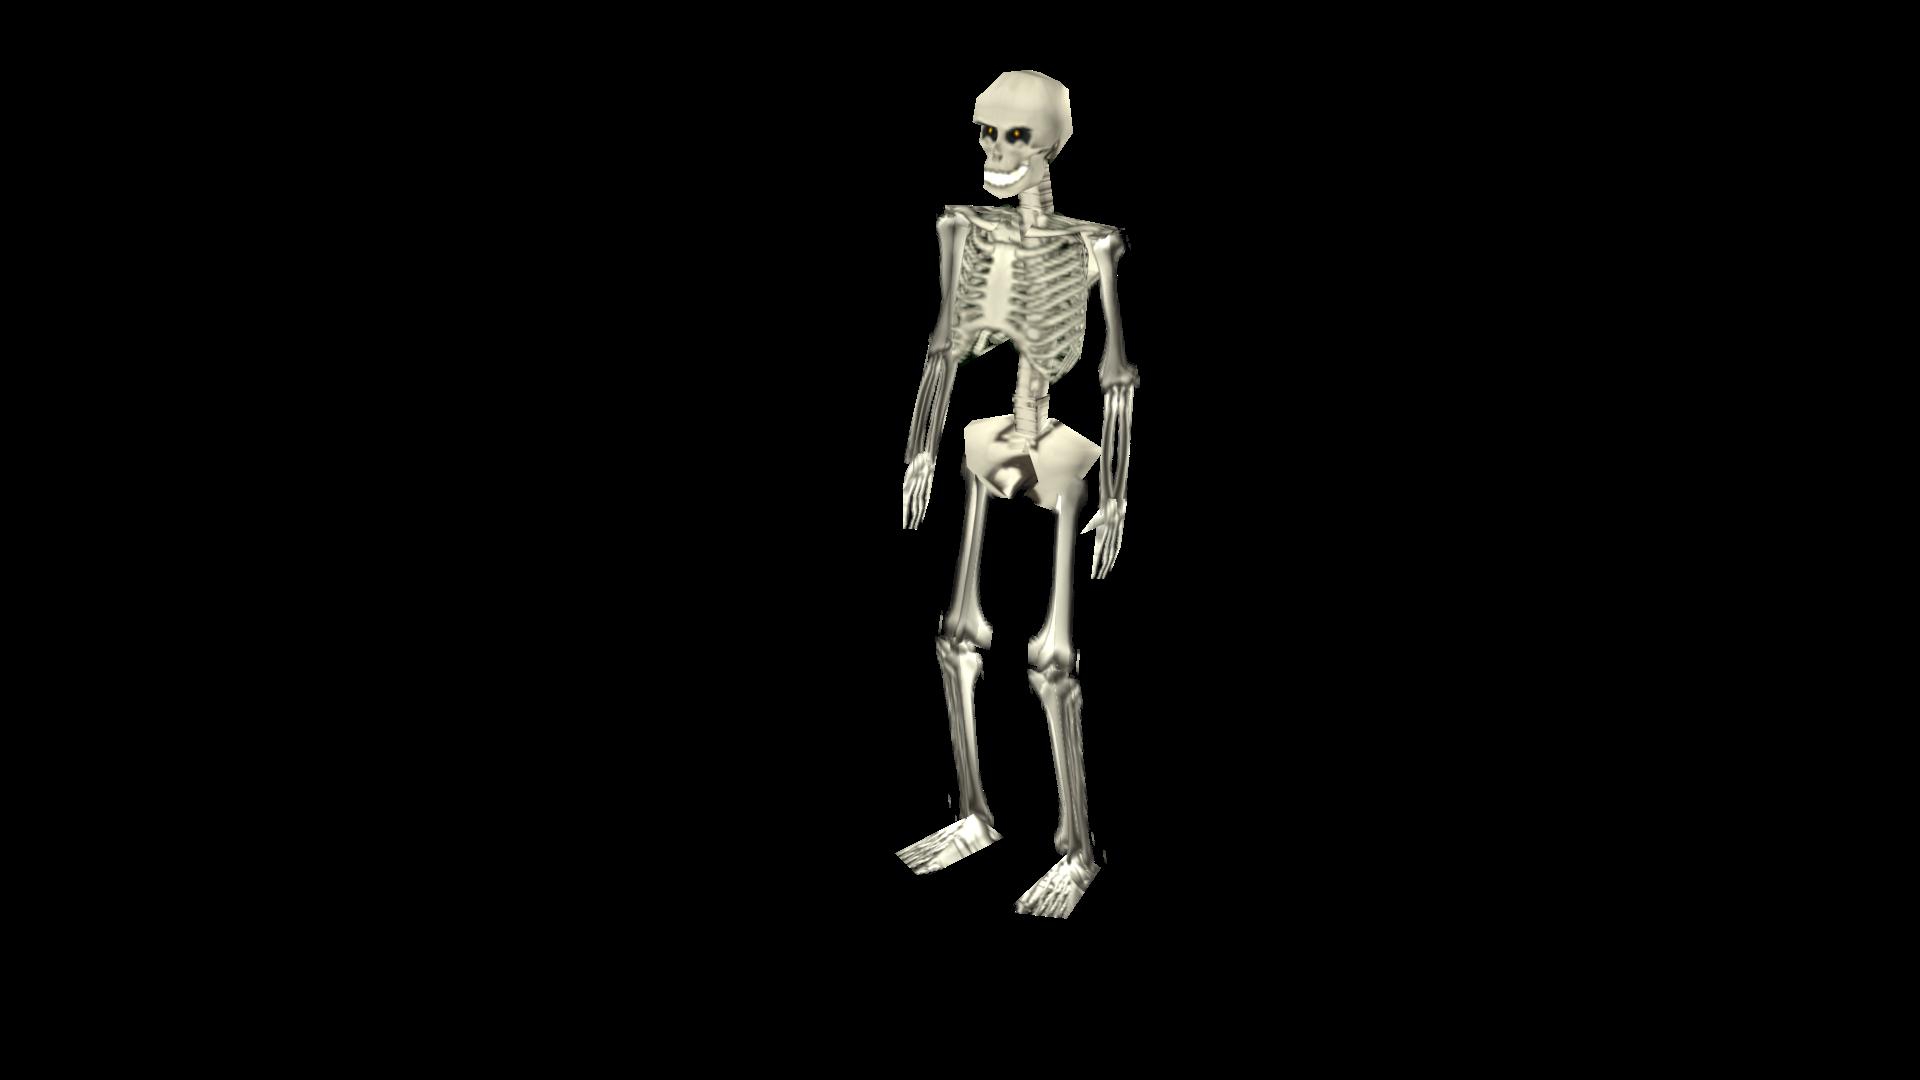 Skeleton Position 1